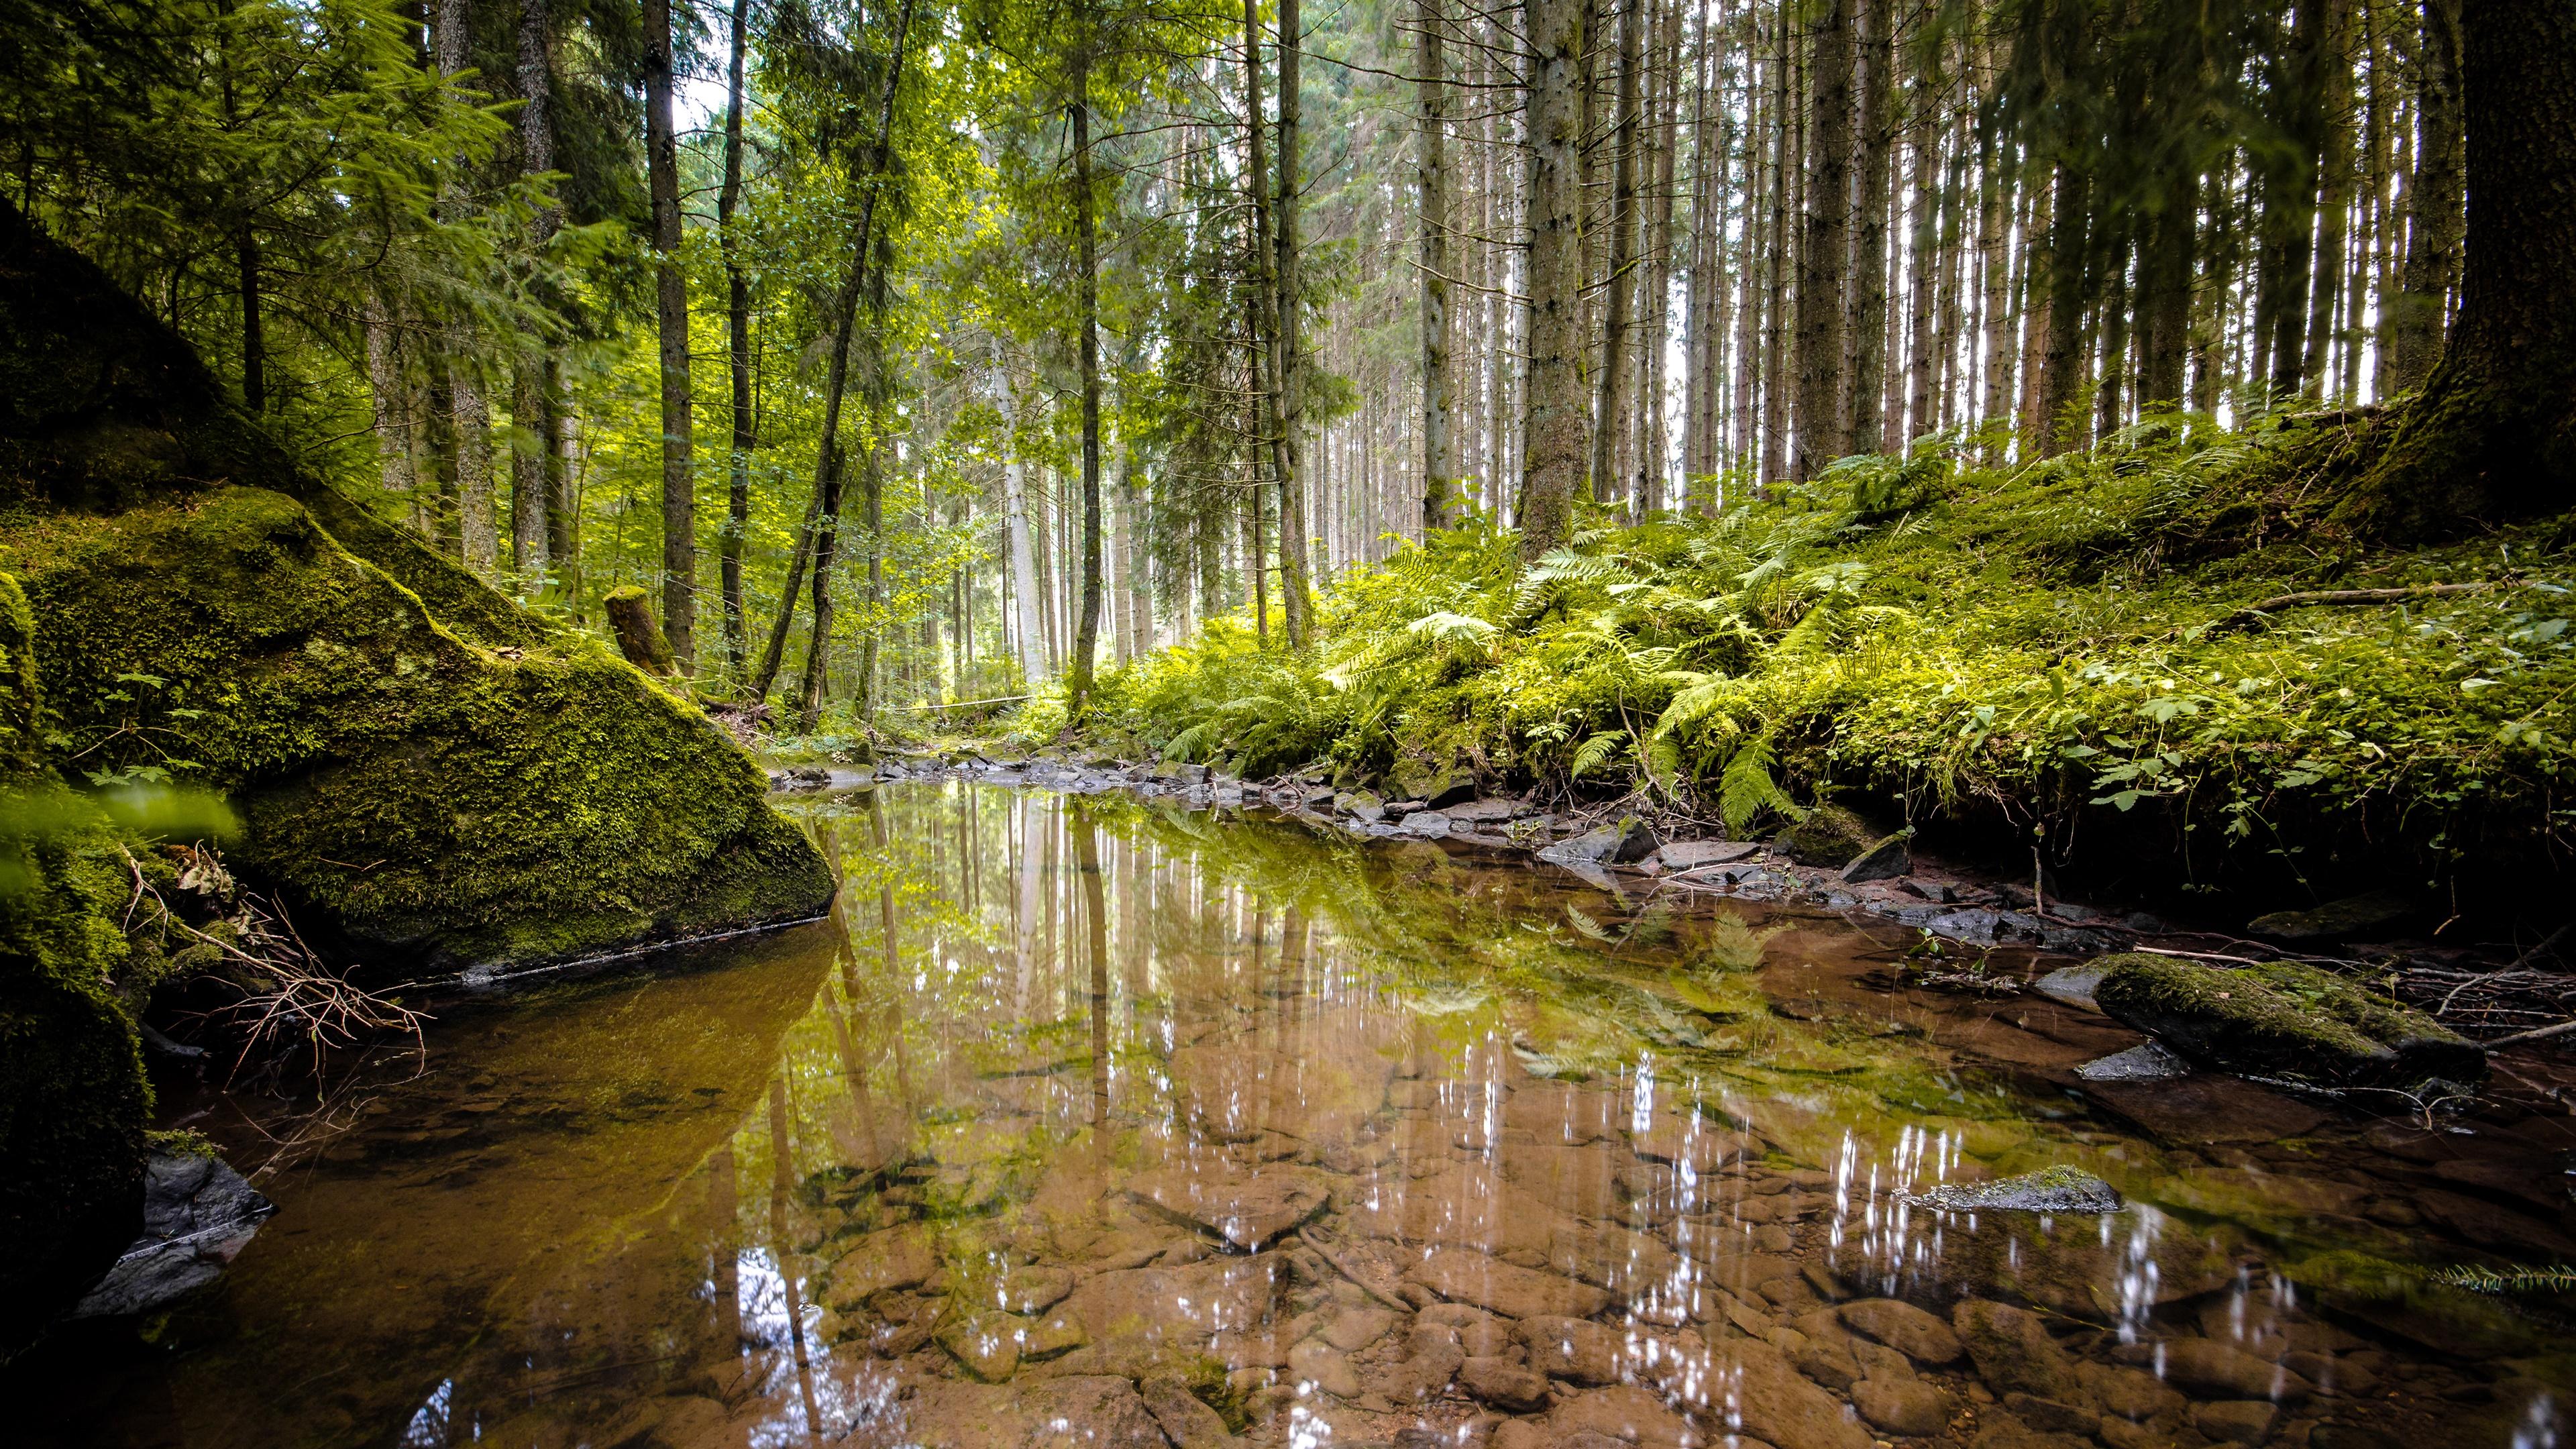 Pond In A Green Forest Wallpaper Riparian Forest 3840x2160 Download Hd Wallpaper Wallpapertip